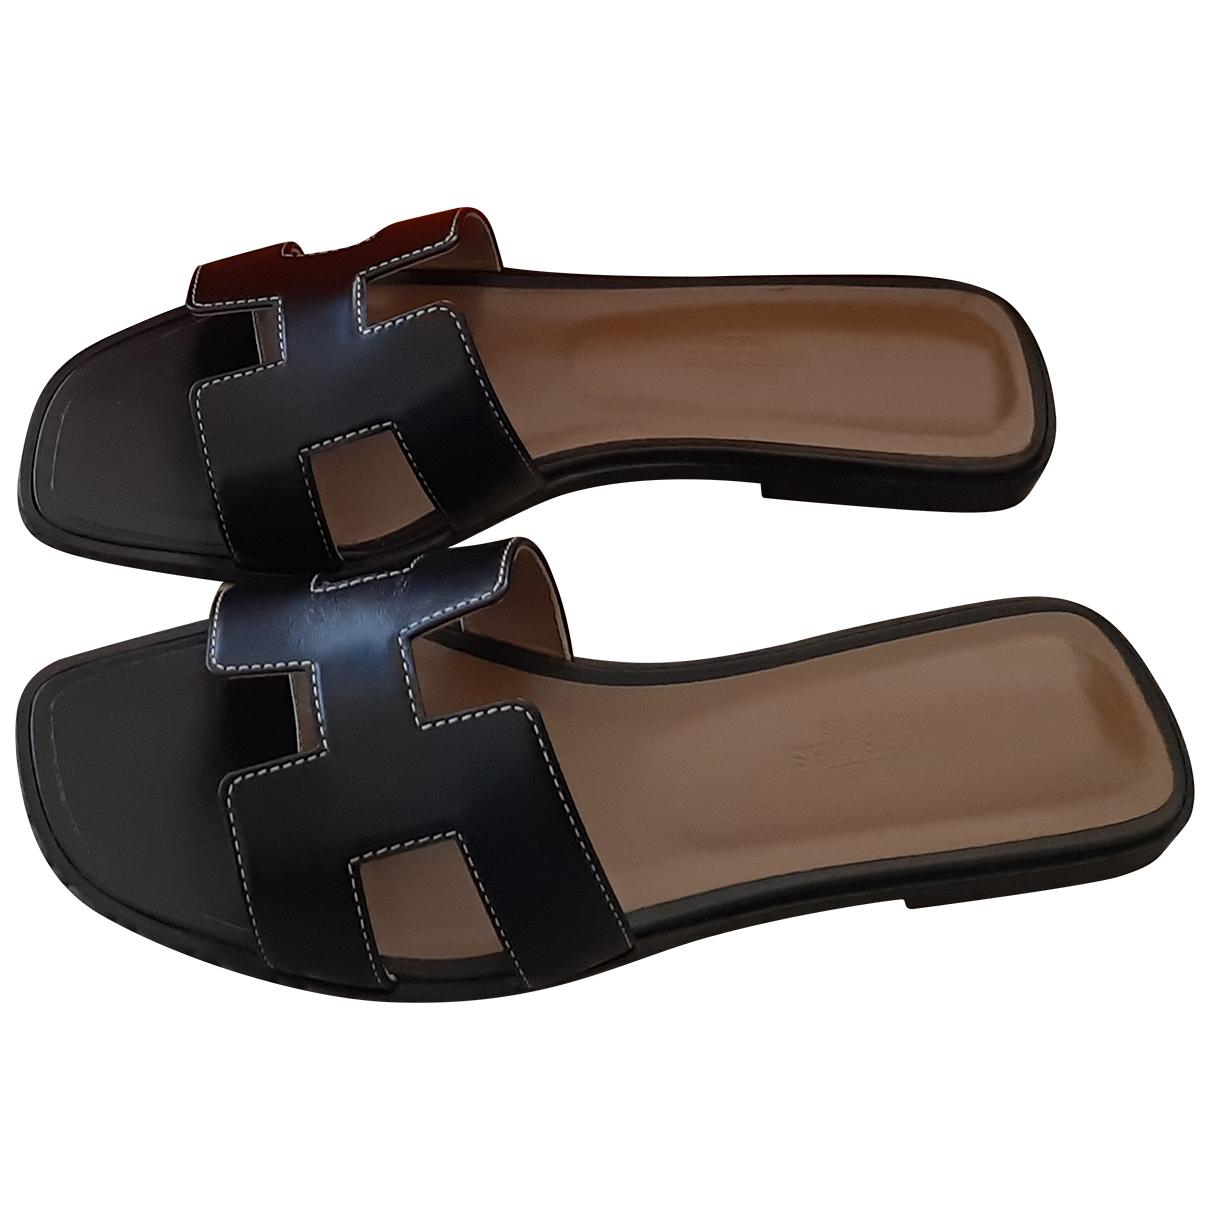 Hermes - Sandales Oran pour femme en cuir - noir